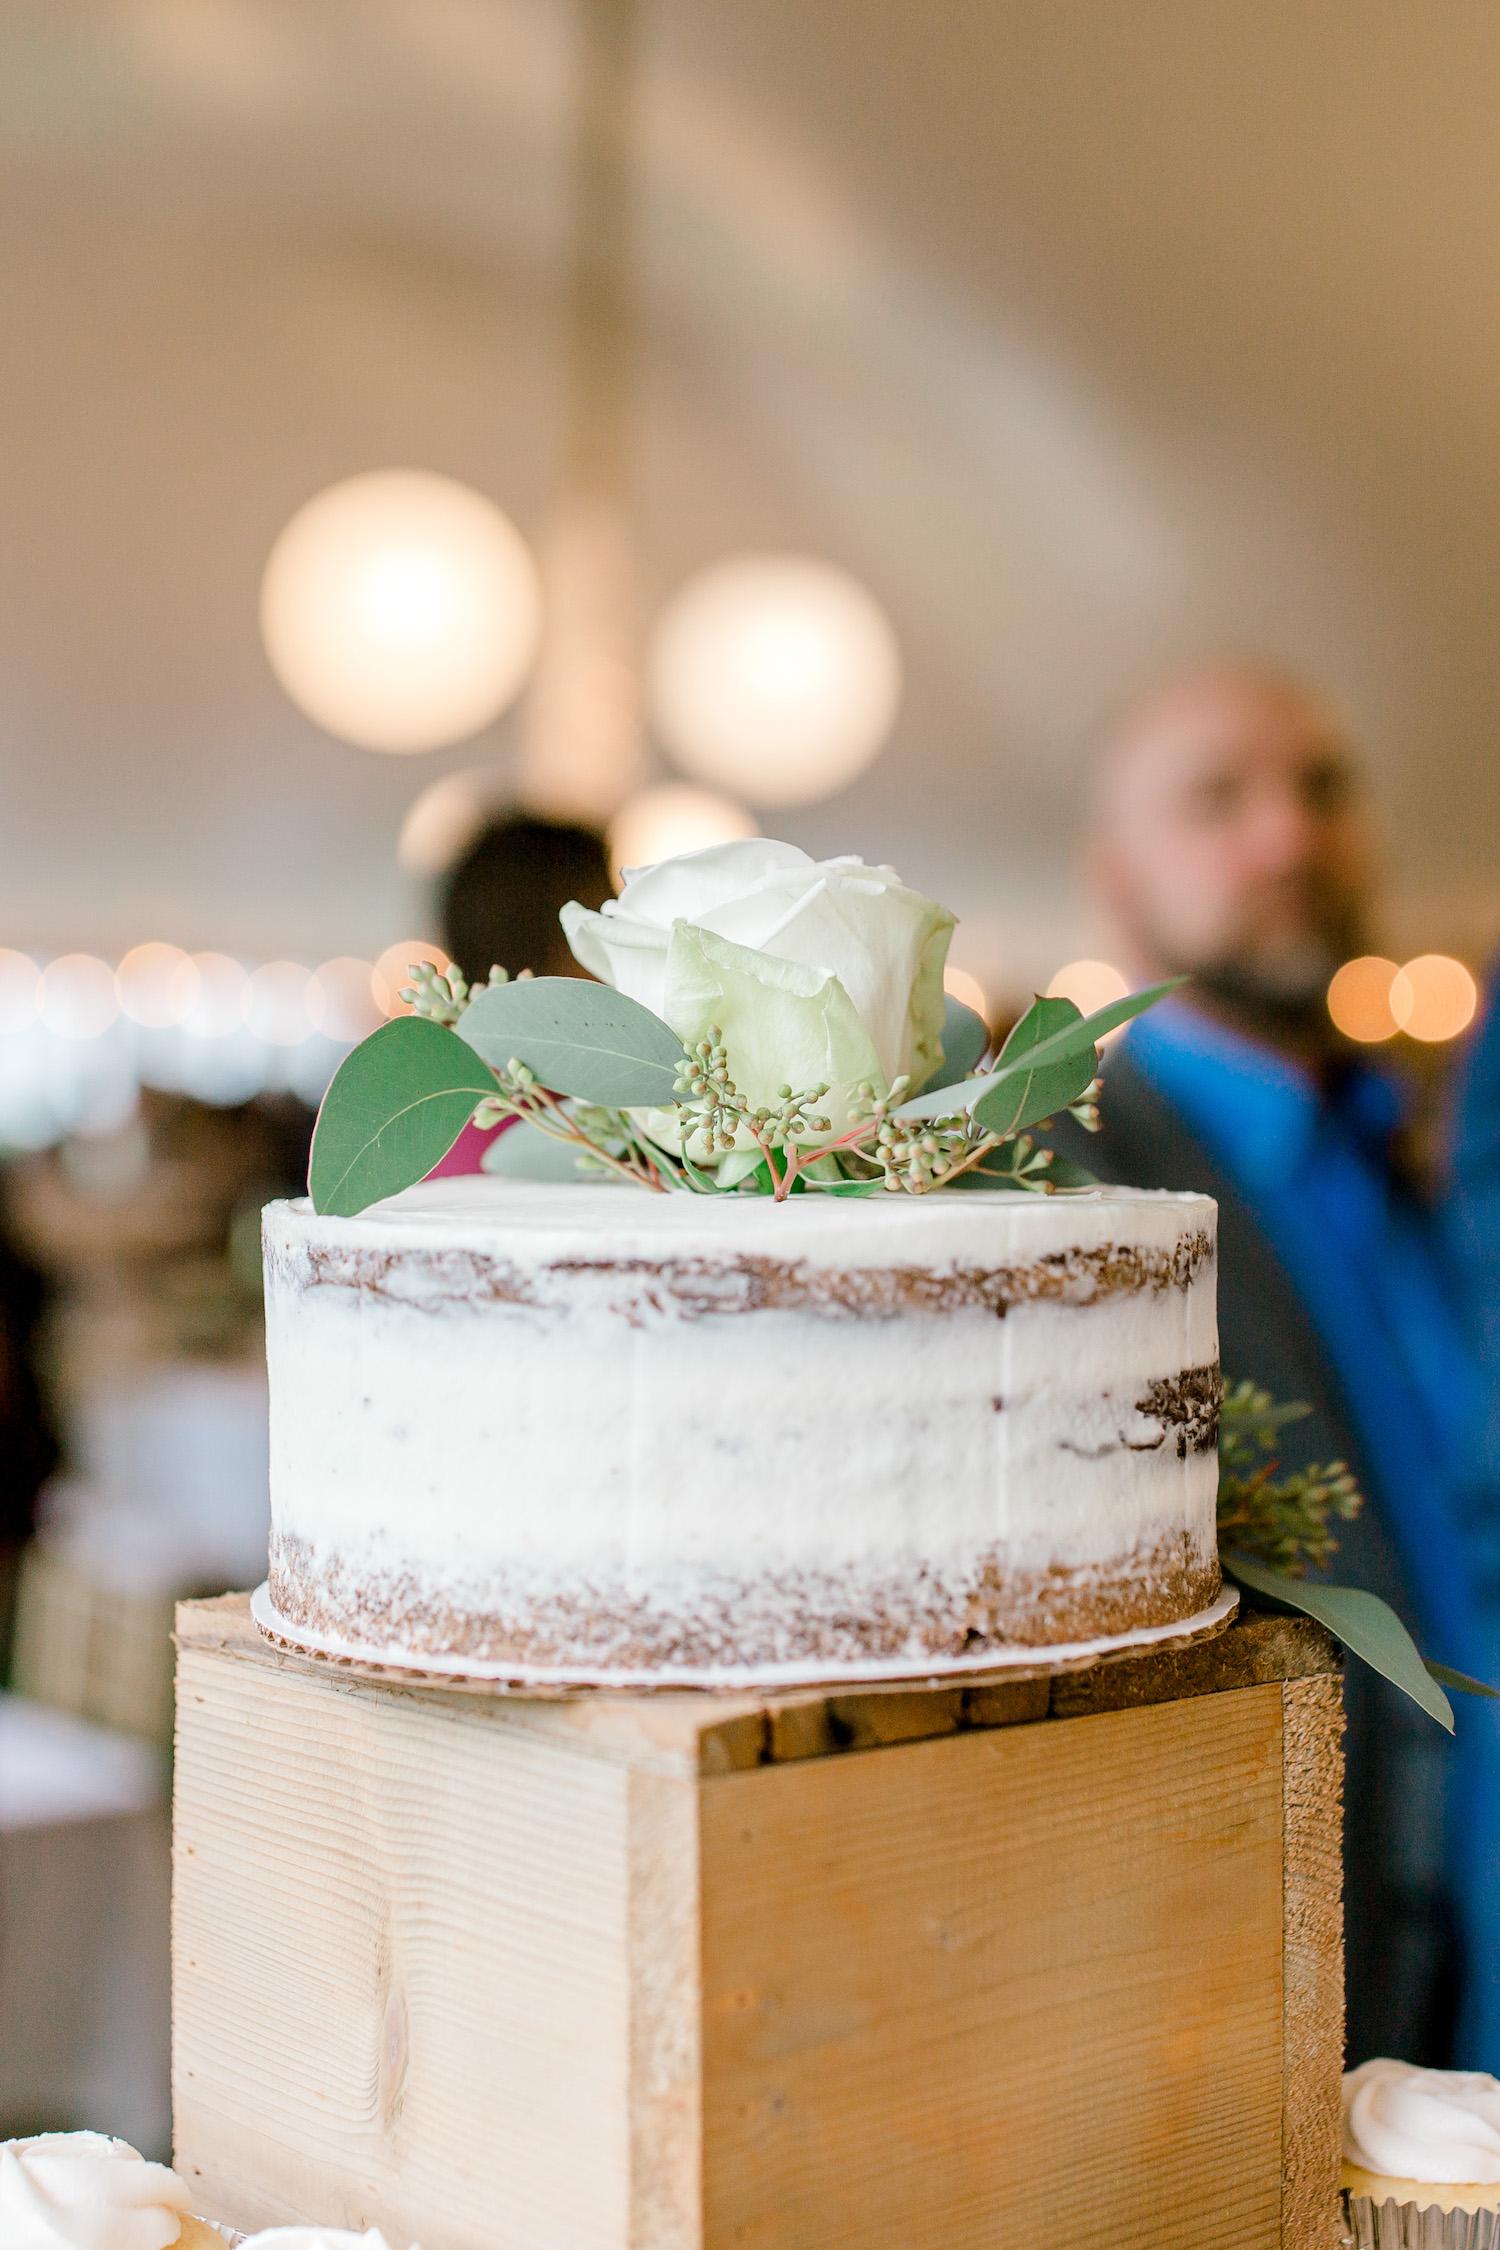 Wallinwood Springs Golf Course wedding cake